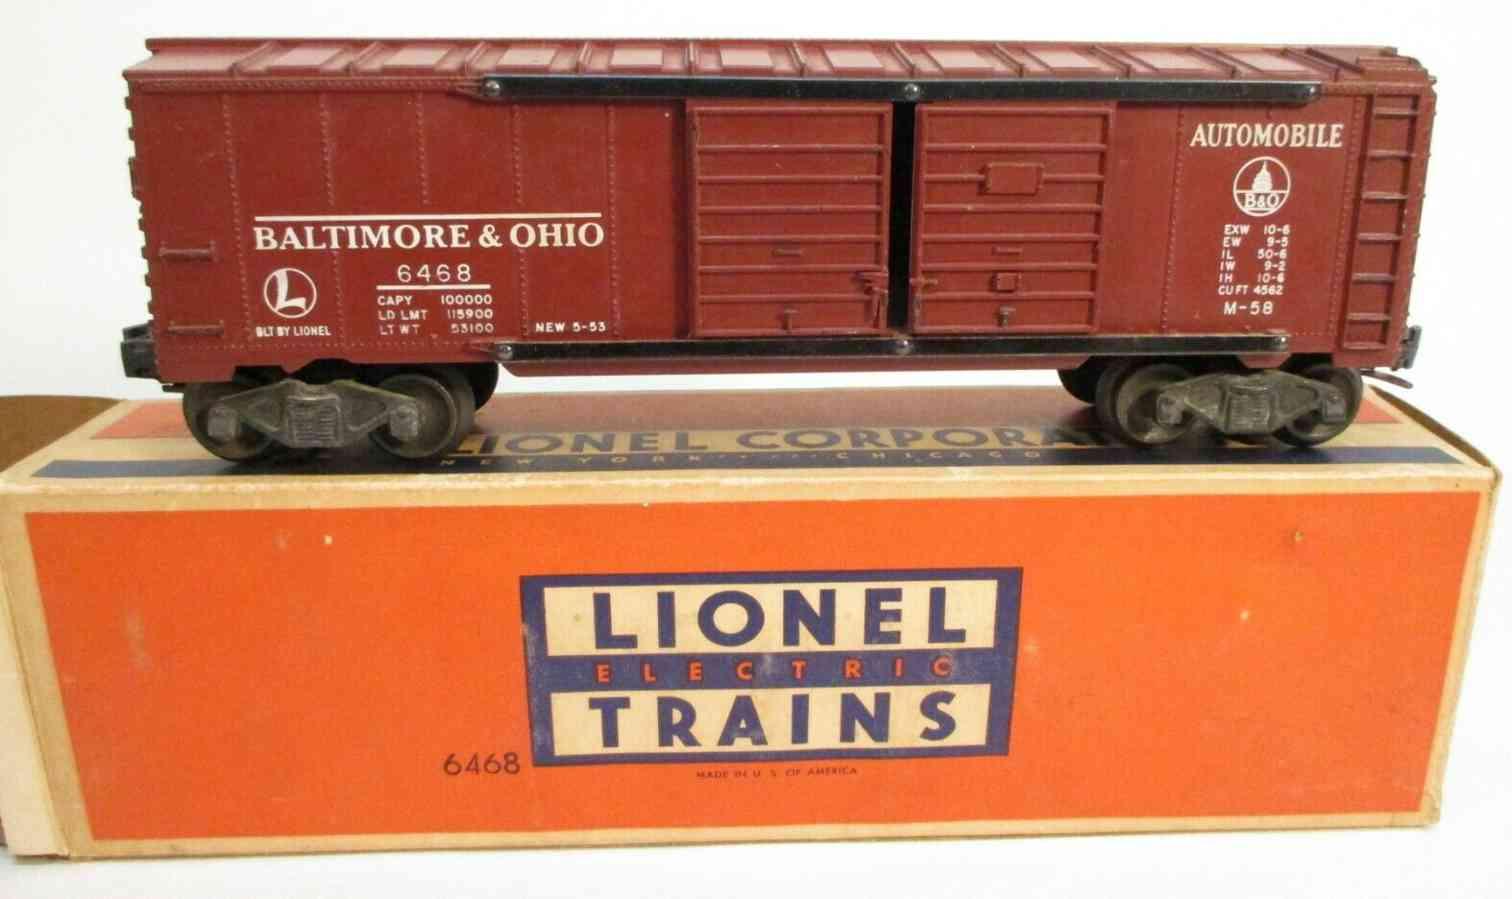 lionel 6468 baltiomore ohio railway toy box car tuscan brown gauge 0